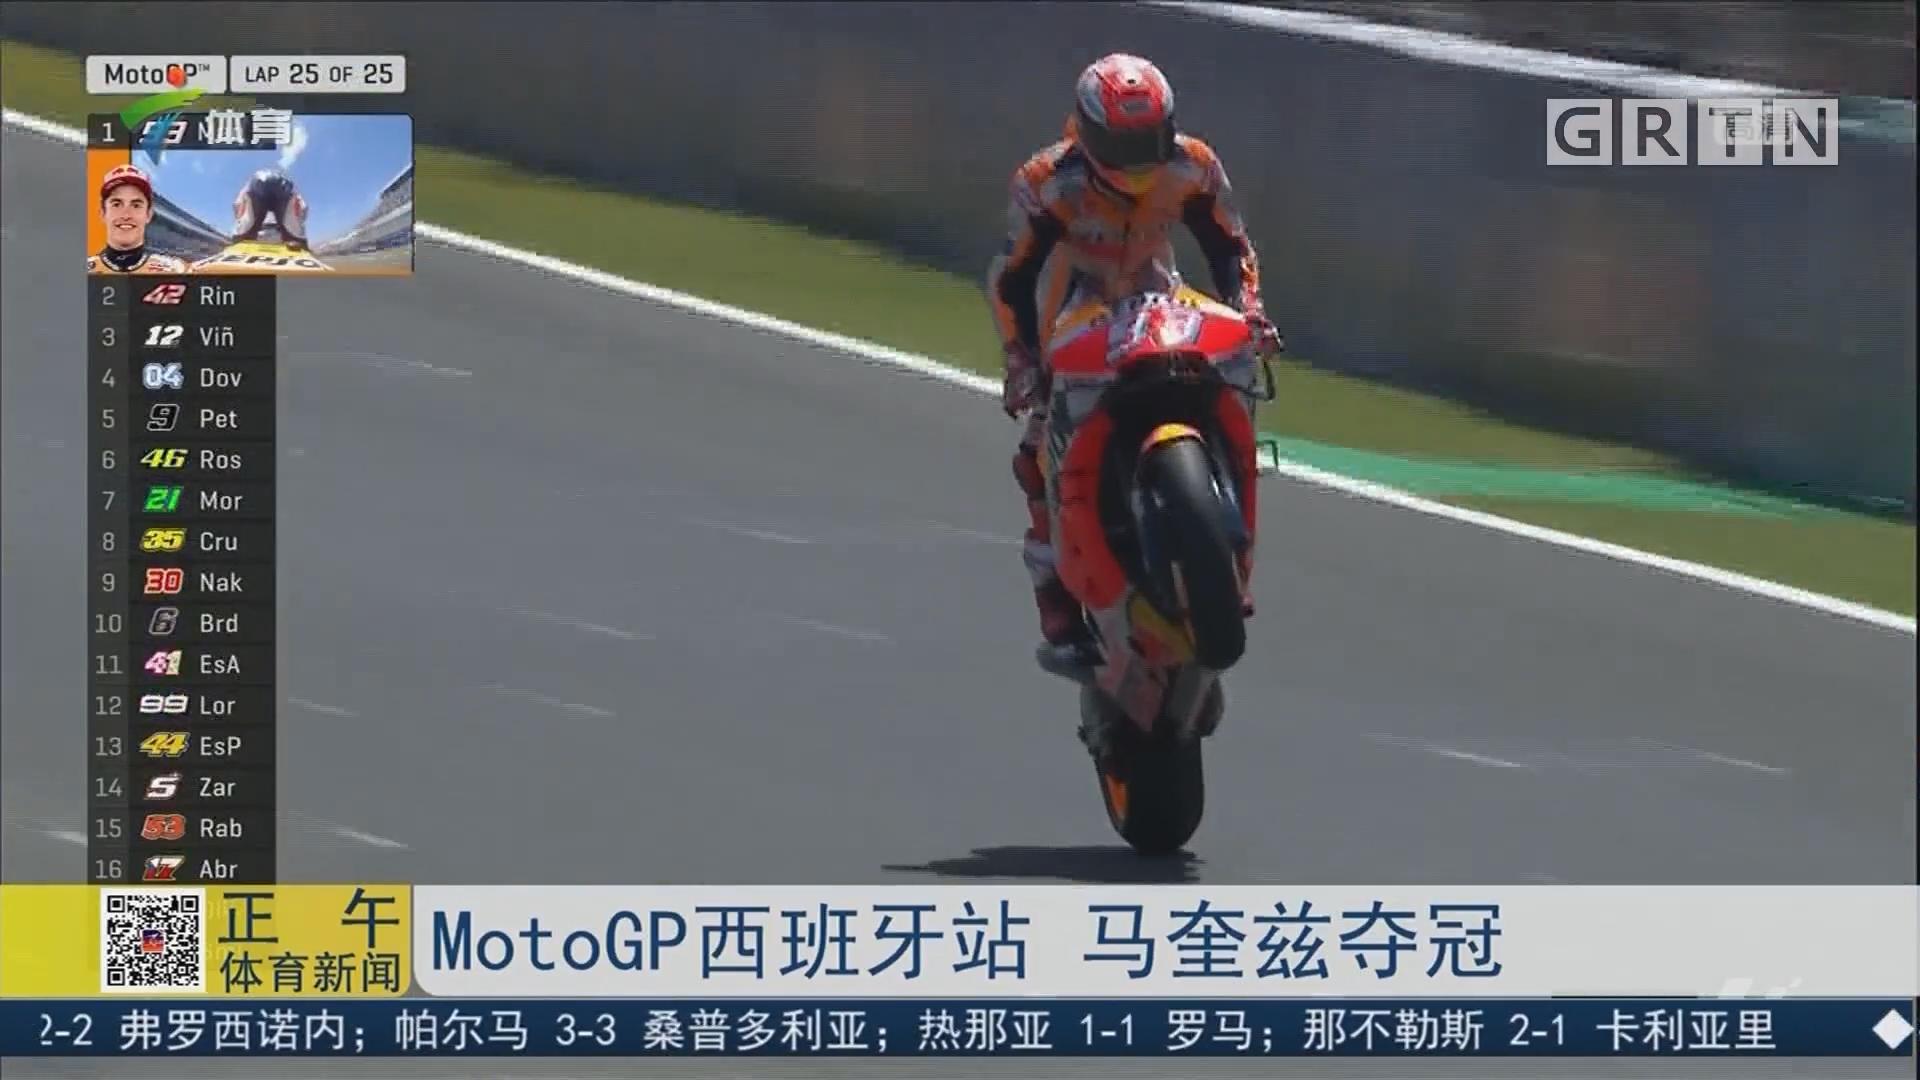 MotoGP西班牙站 马奎兹夺冠